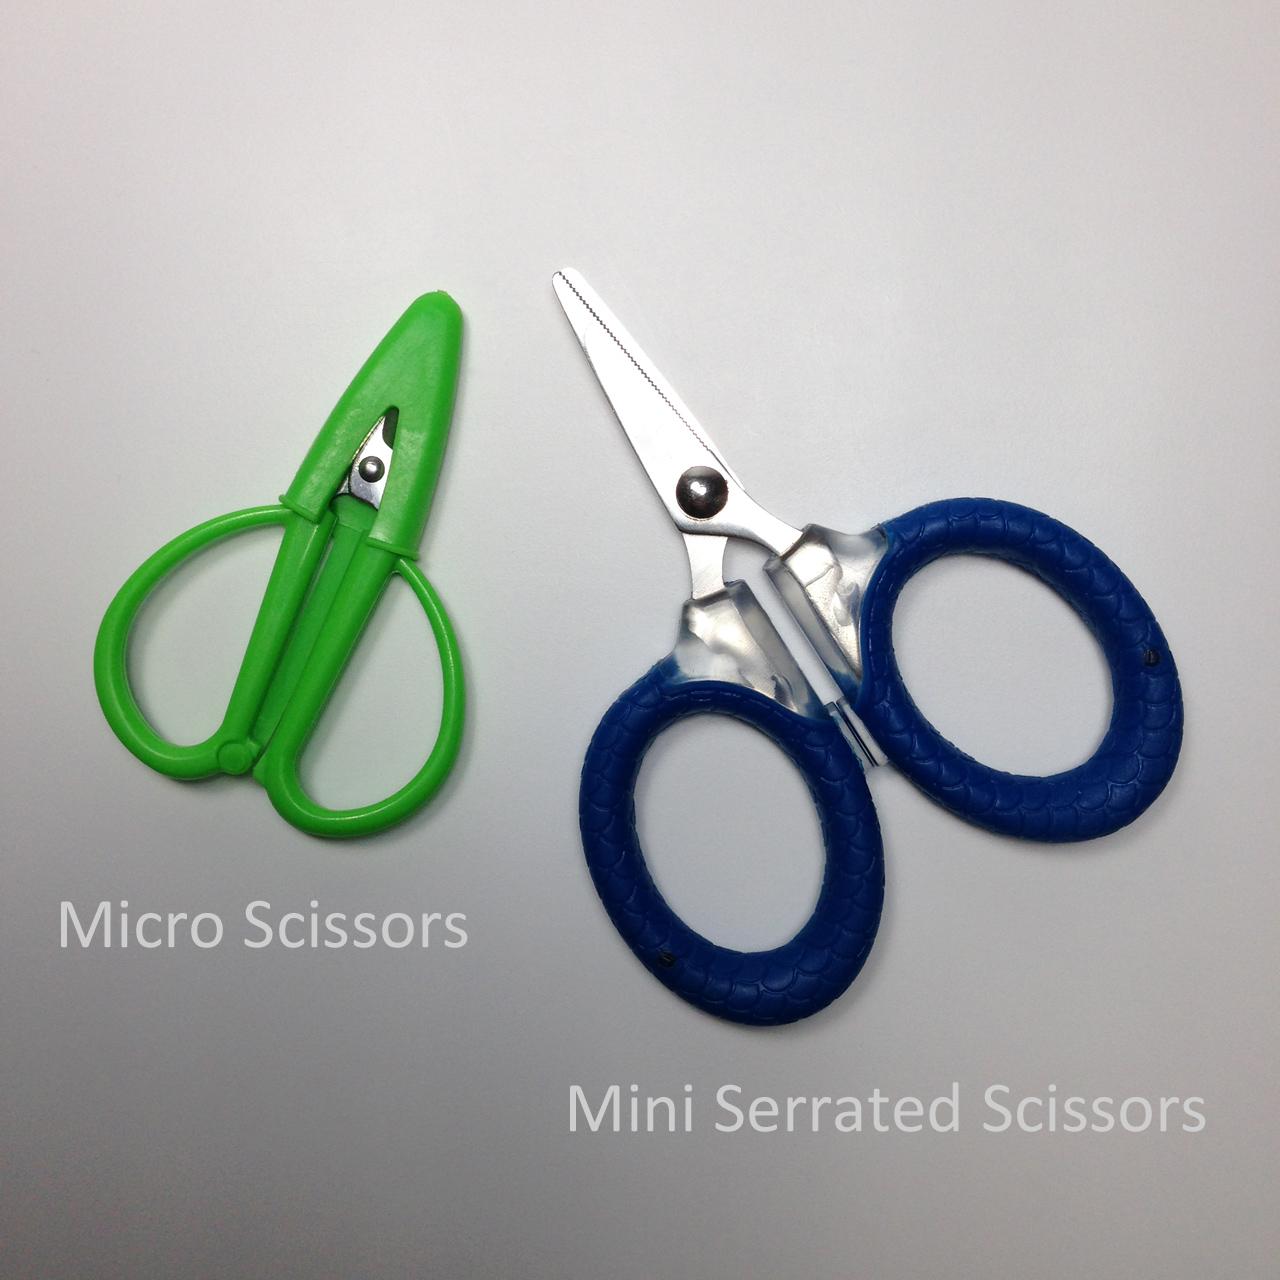 cuda-mini-vs-micro.jpg